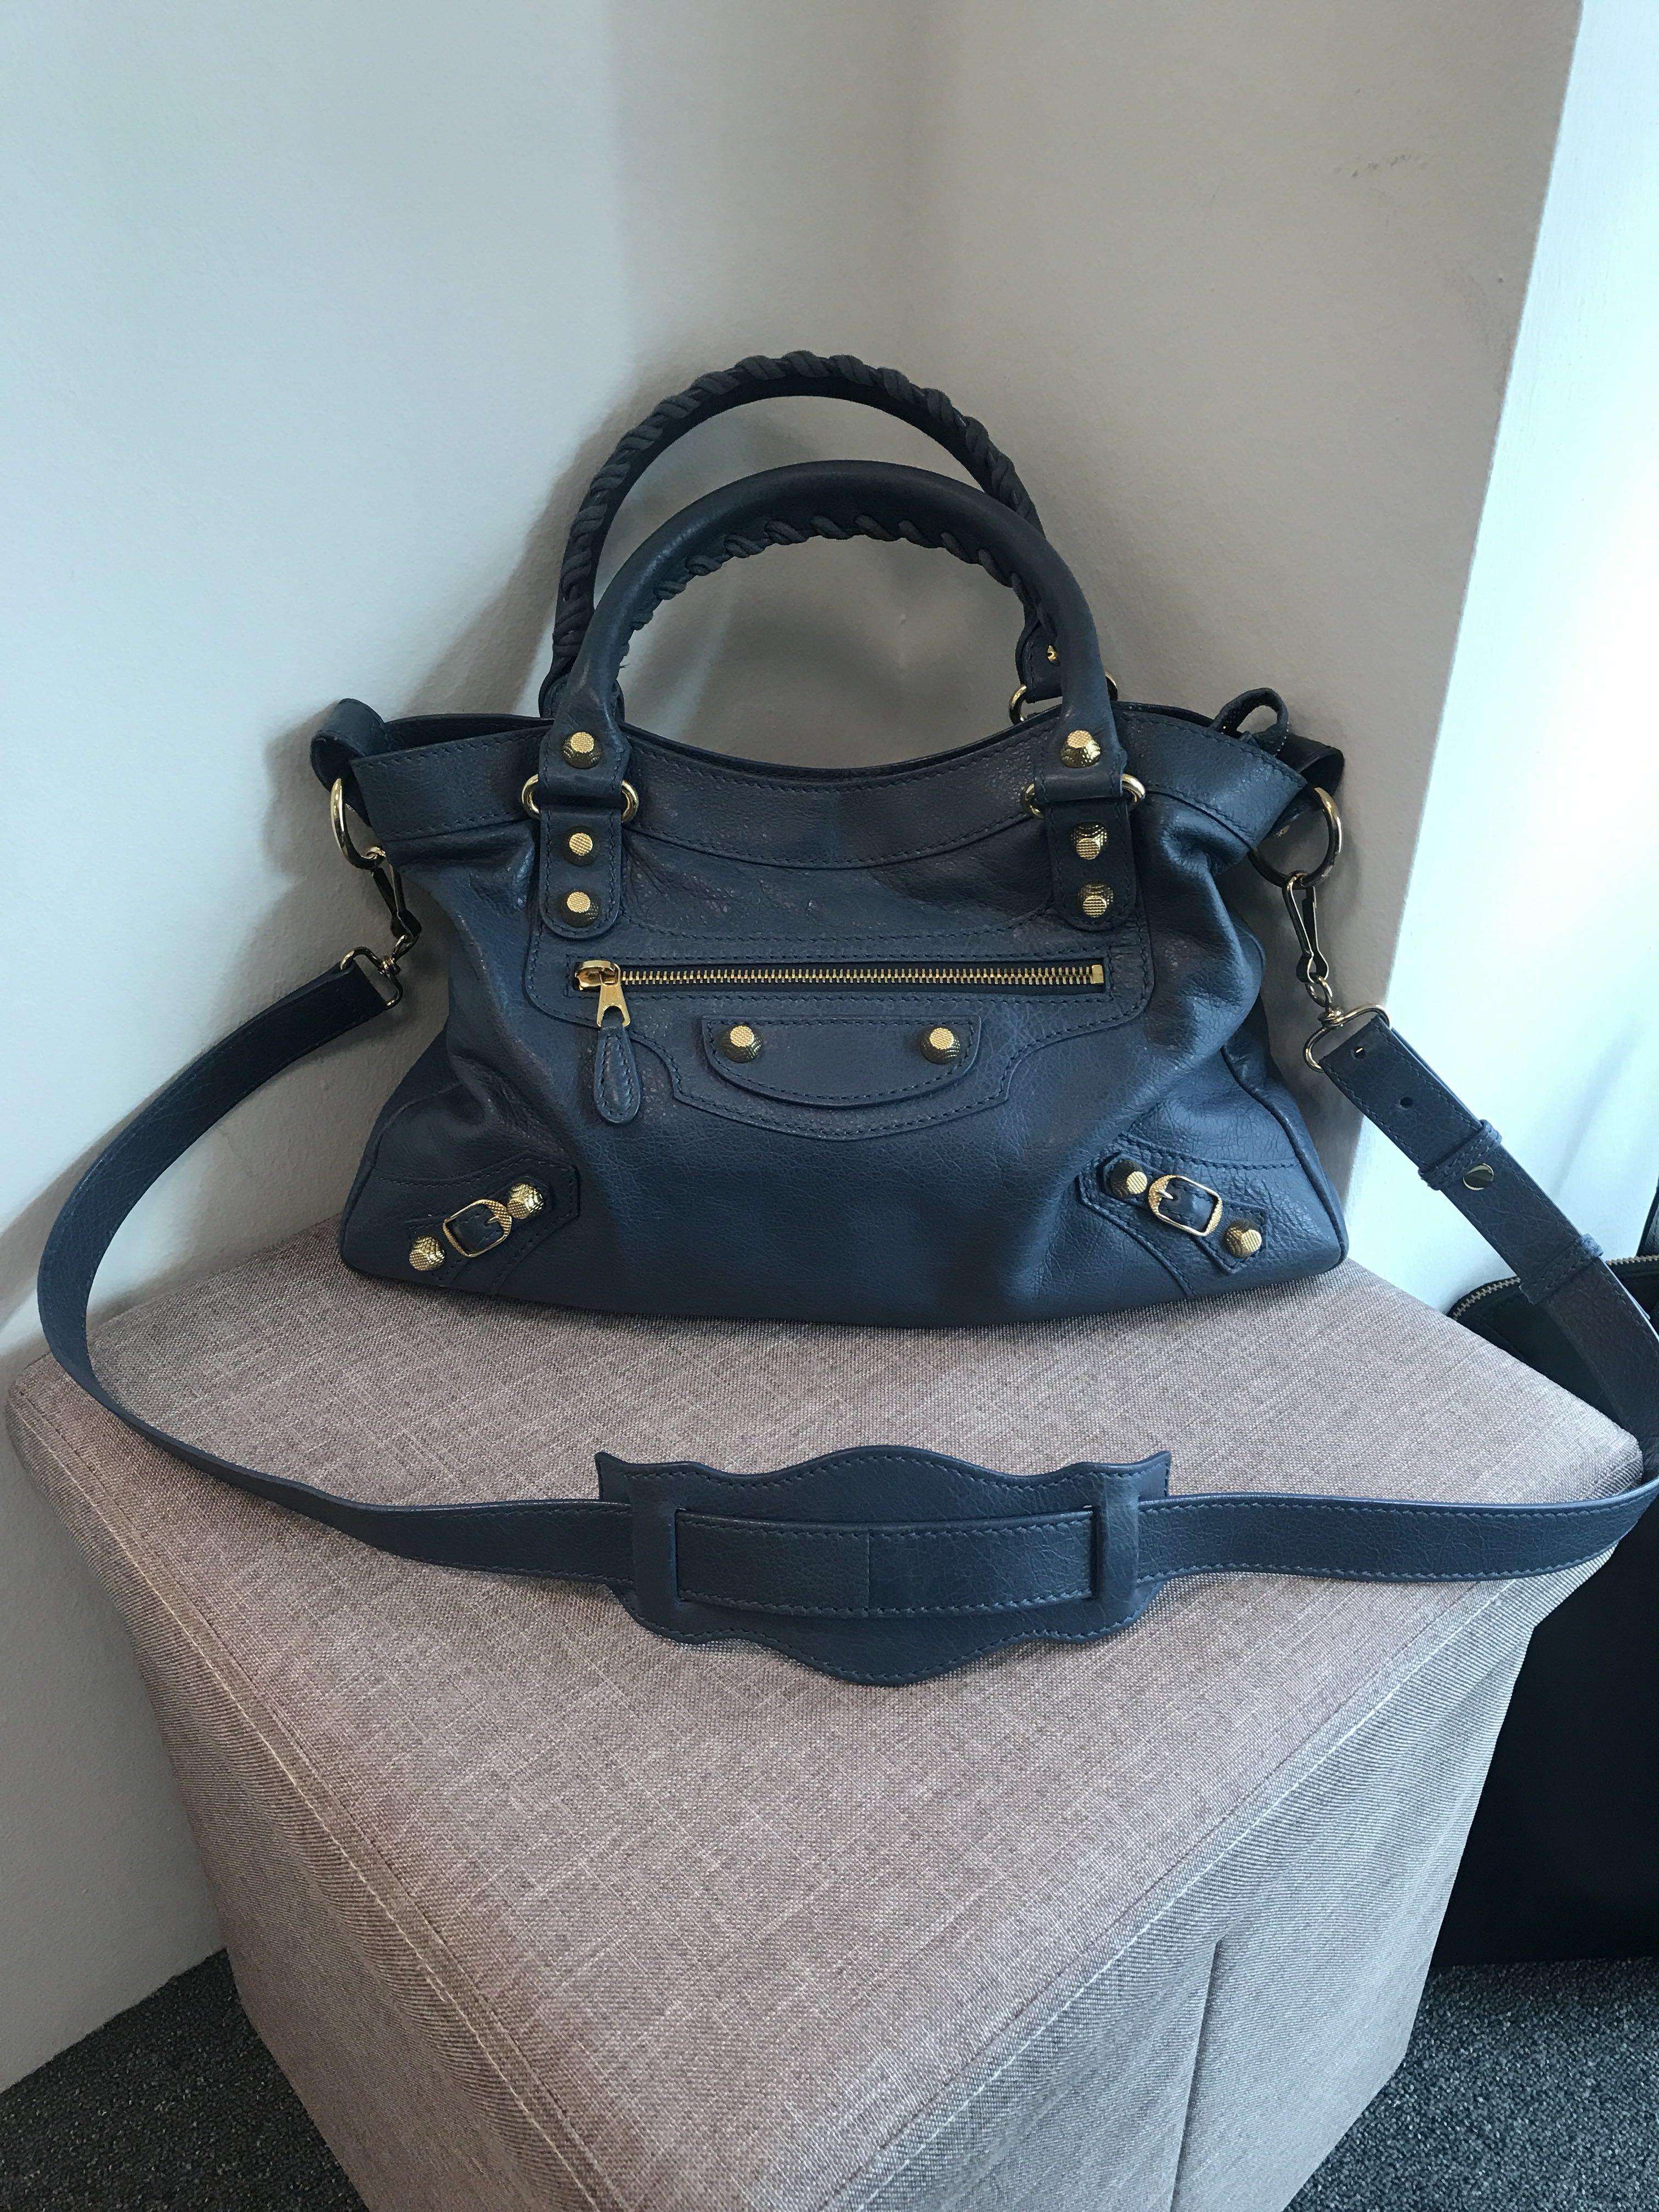 balenciaga town bag - 59% remise - www